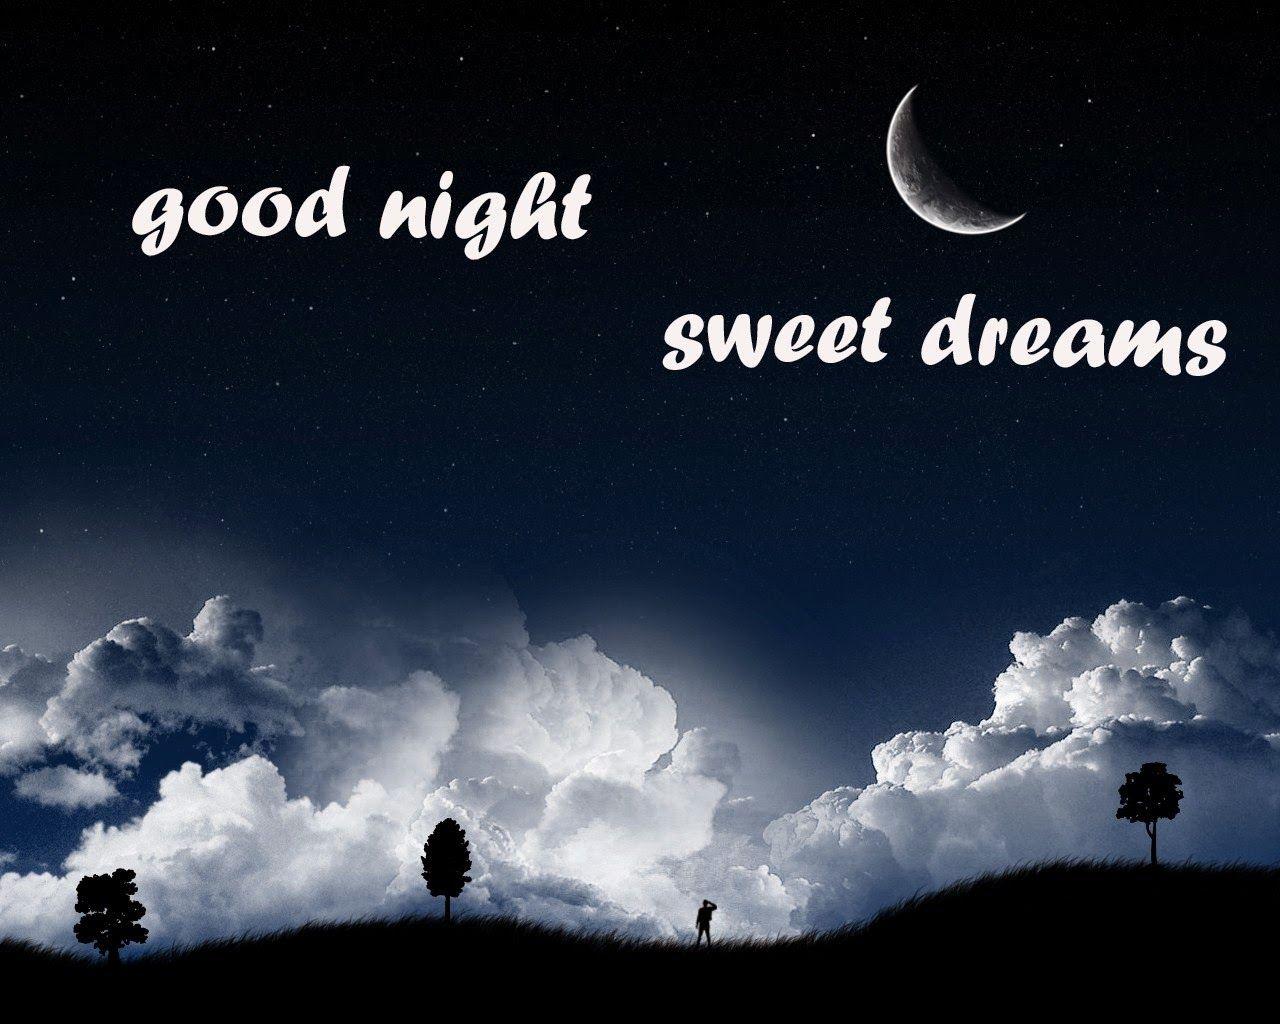 Good Night Wallpapers Mobile Wallpapers 12801024 Wallpaper